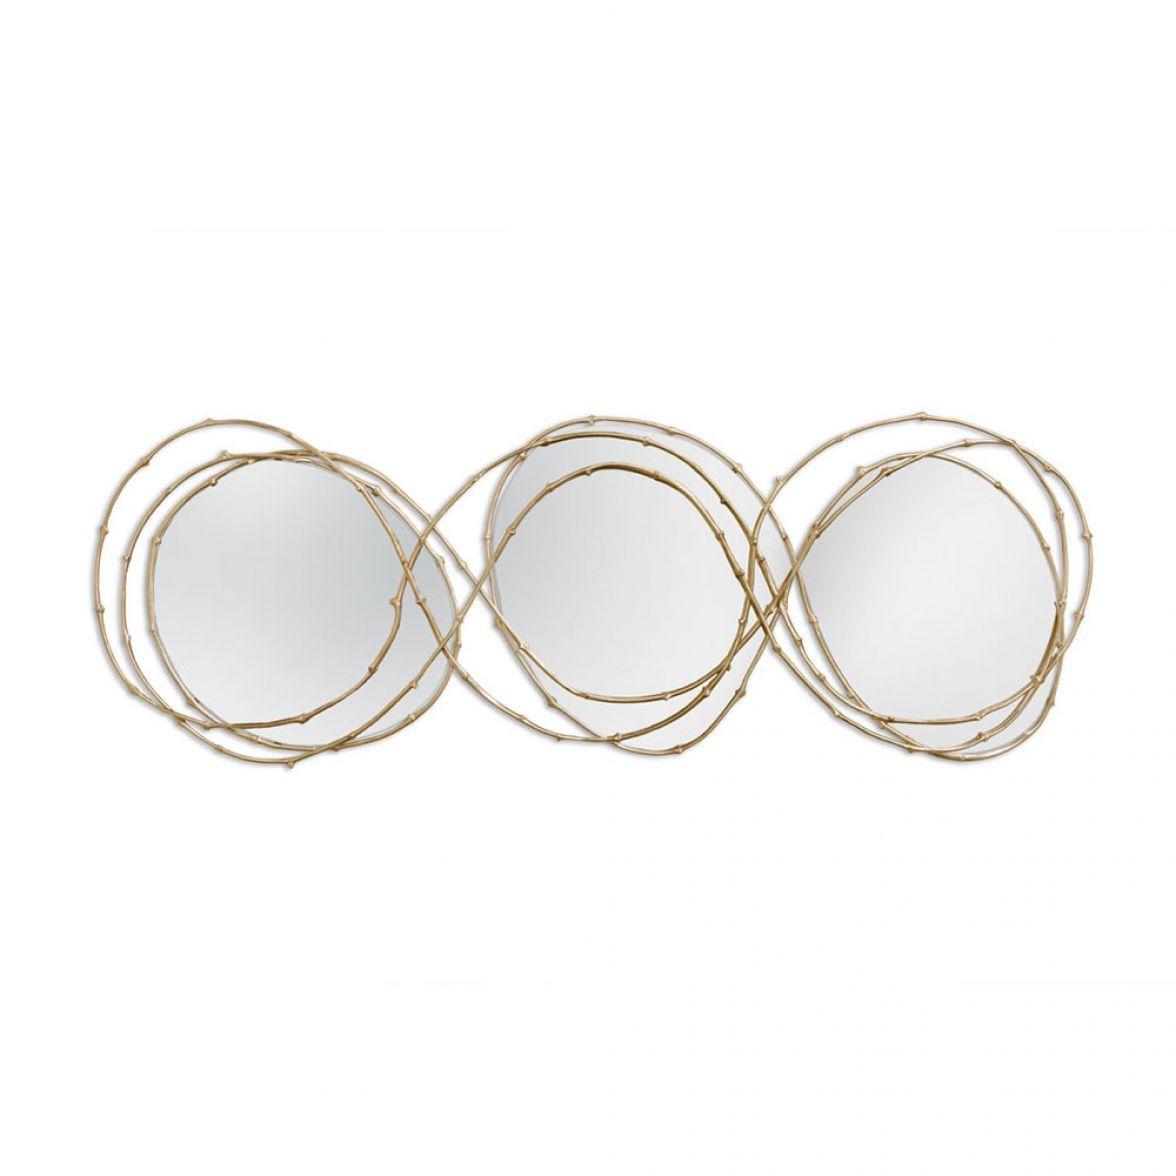 Зеркало Vine Triptych фото цена